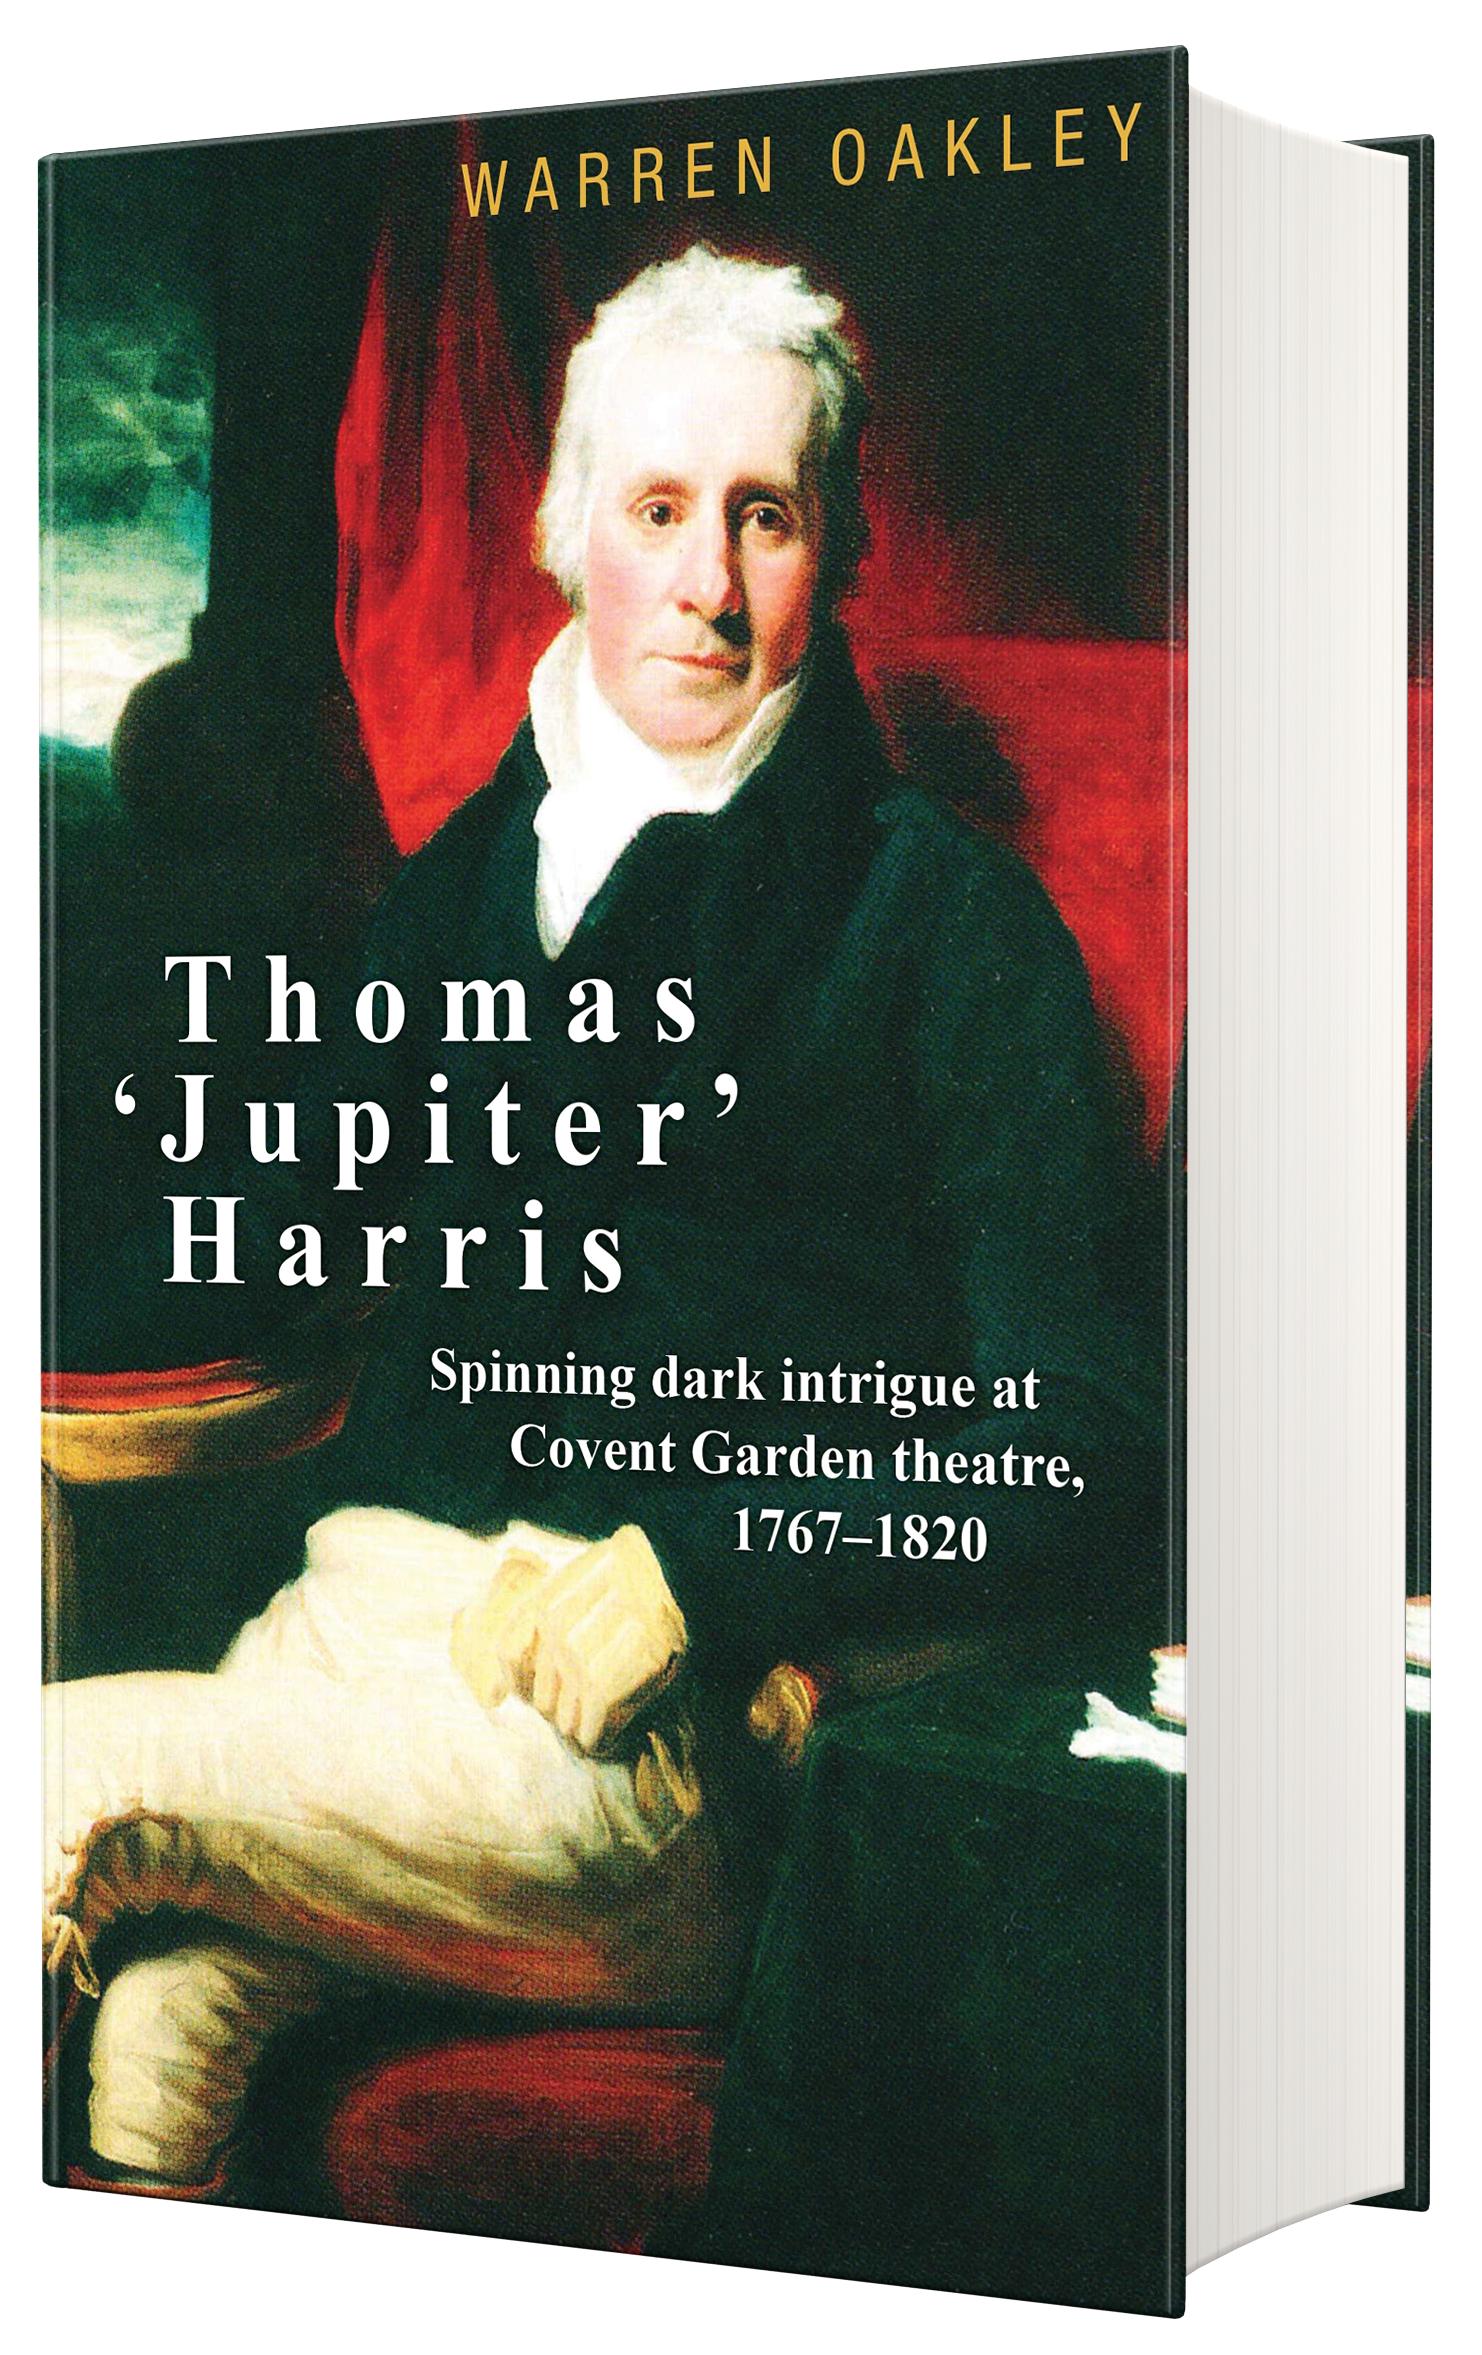 Thomas 'Jupiter' Harris – Q&A with Warren Oakley